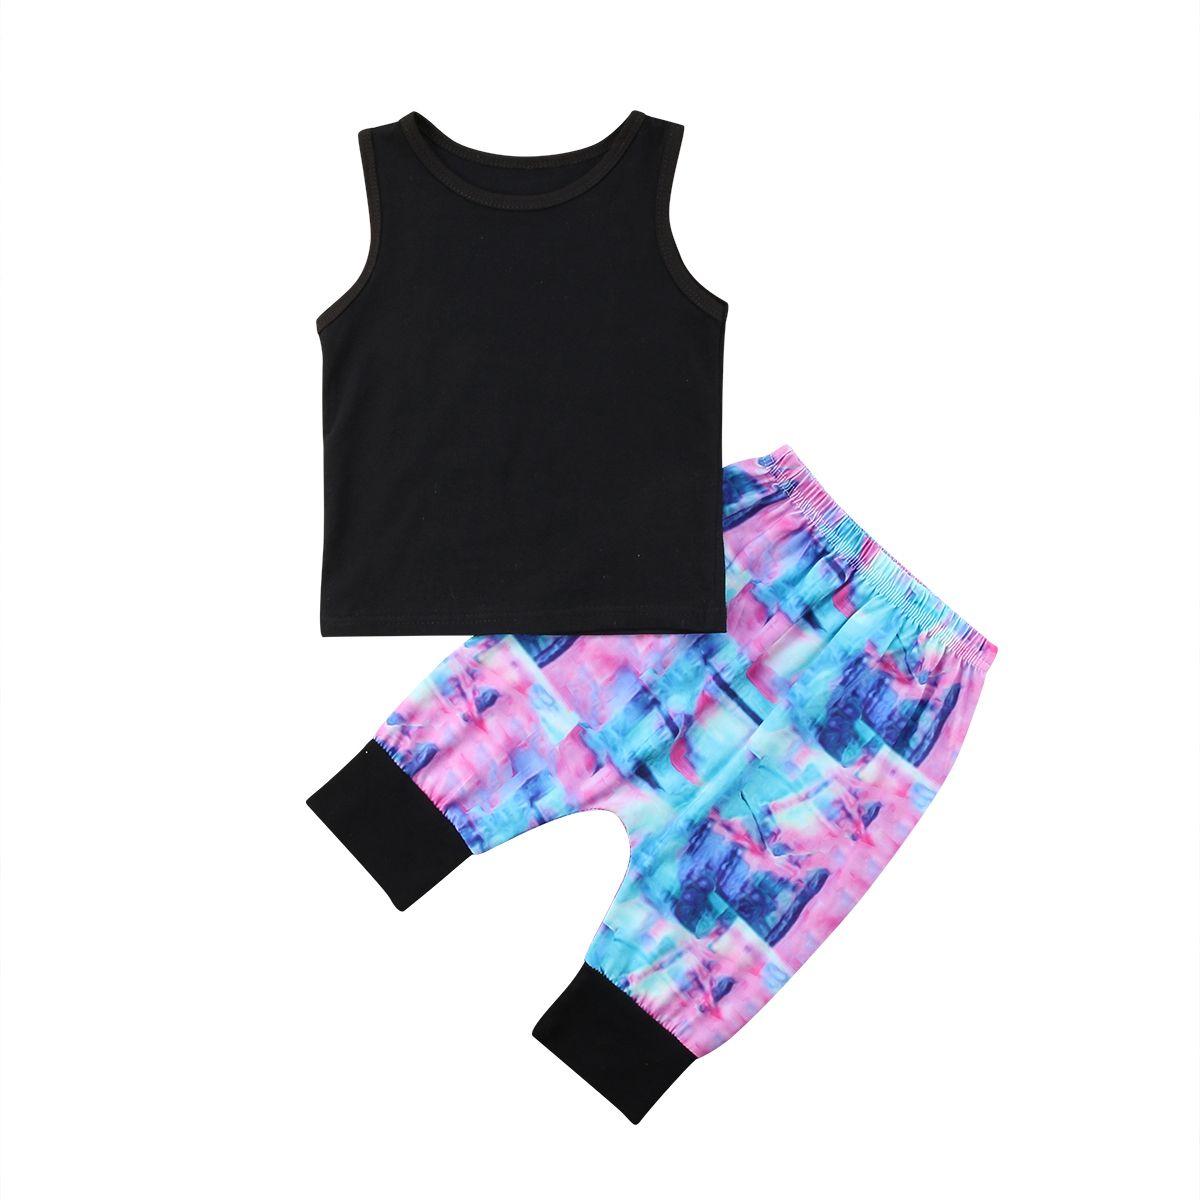 2e2024425 Boys Kids Baby Boys Solid Black Vest Tank Tops+Half Printed Colorful ...